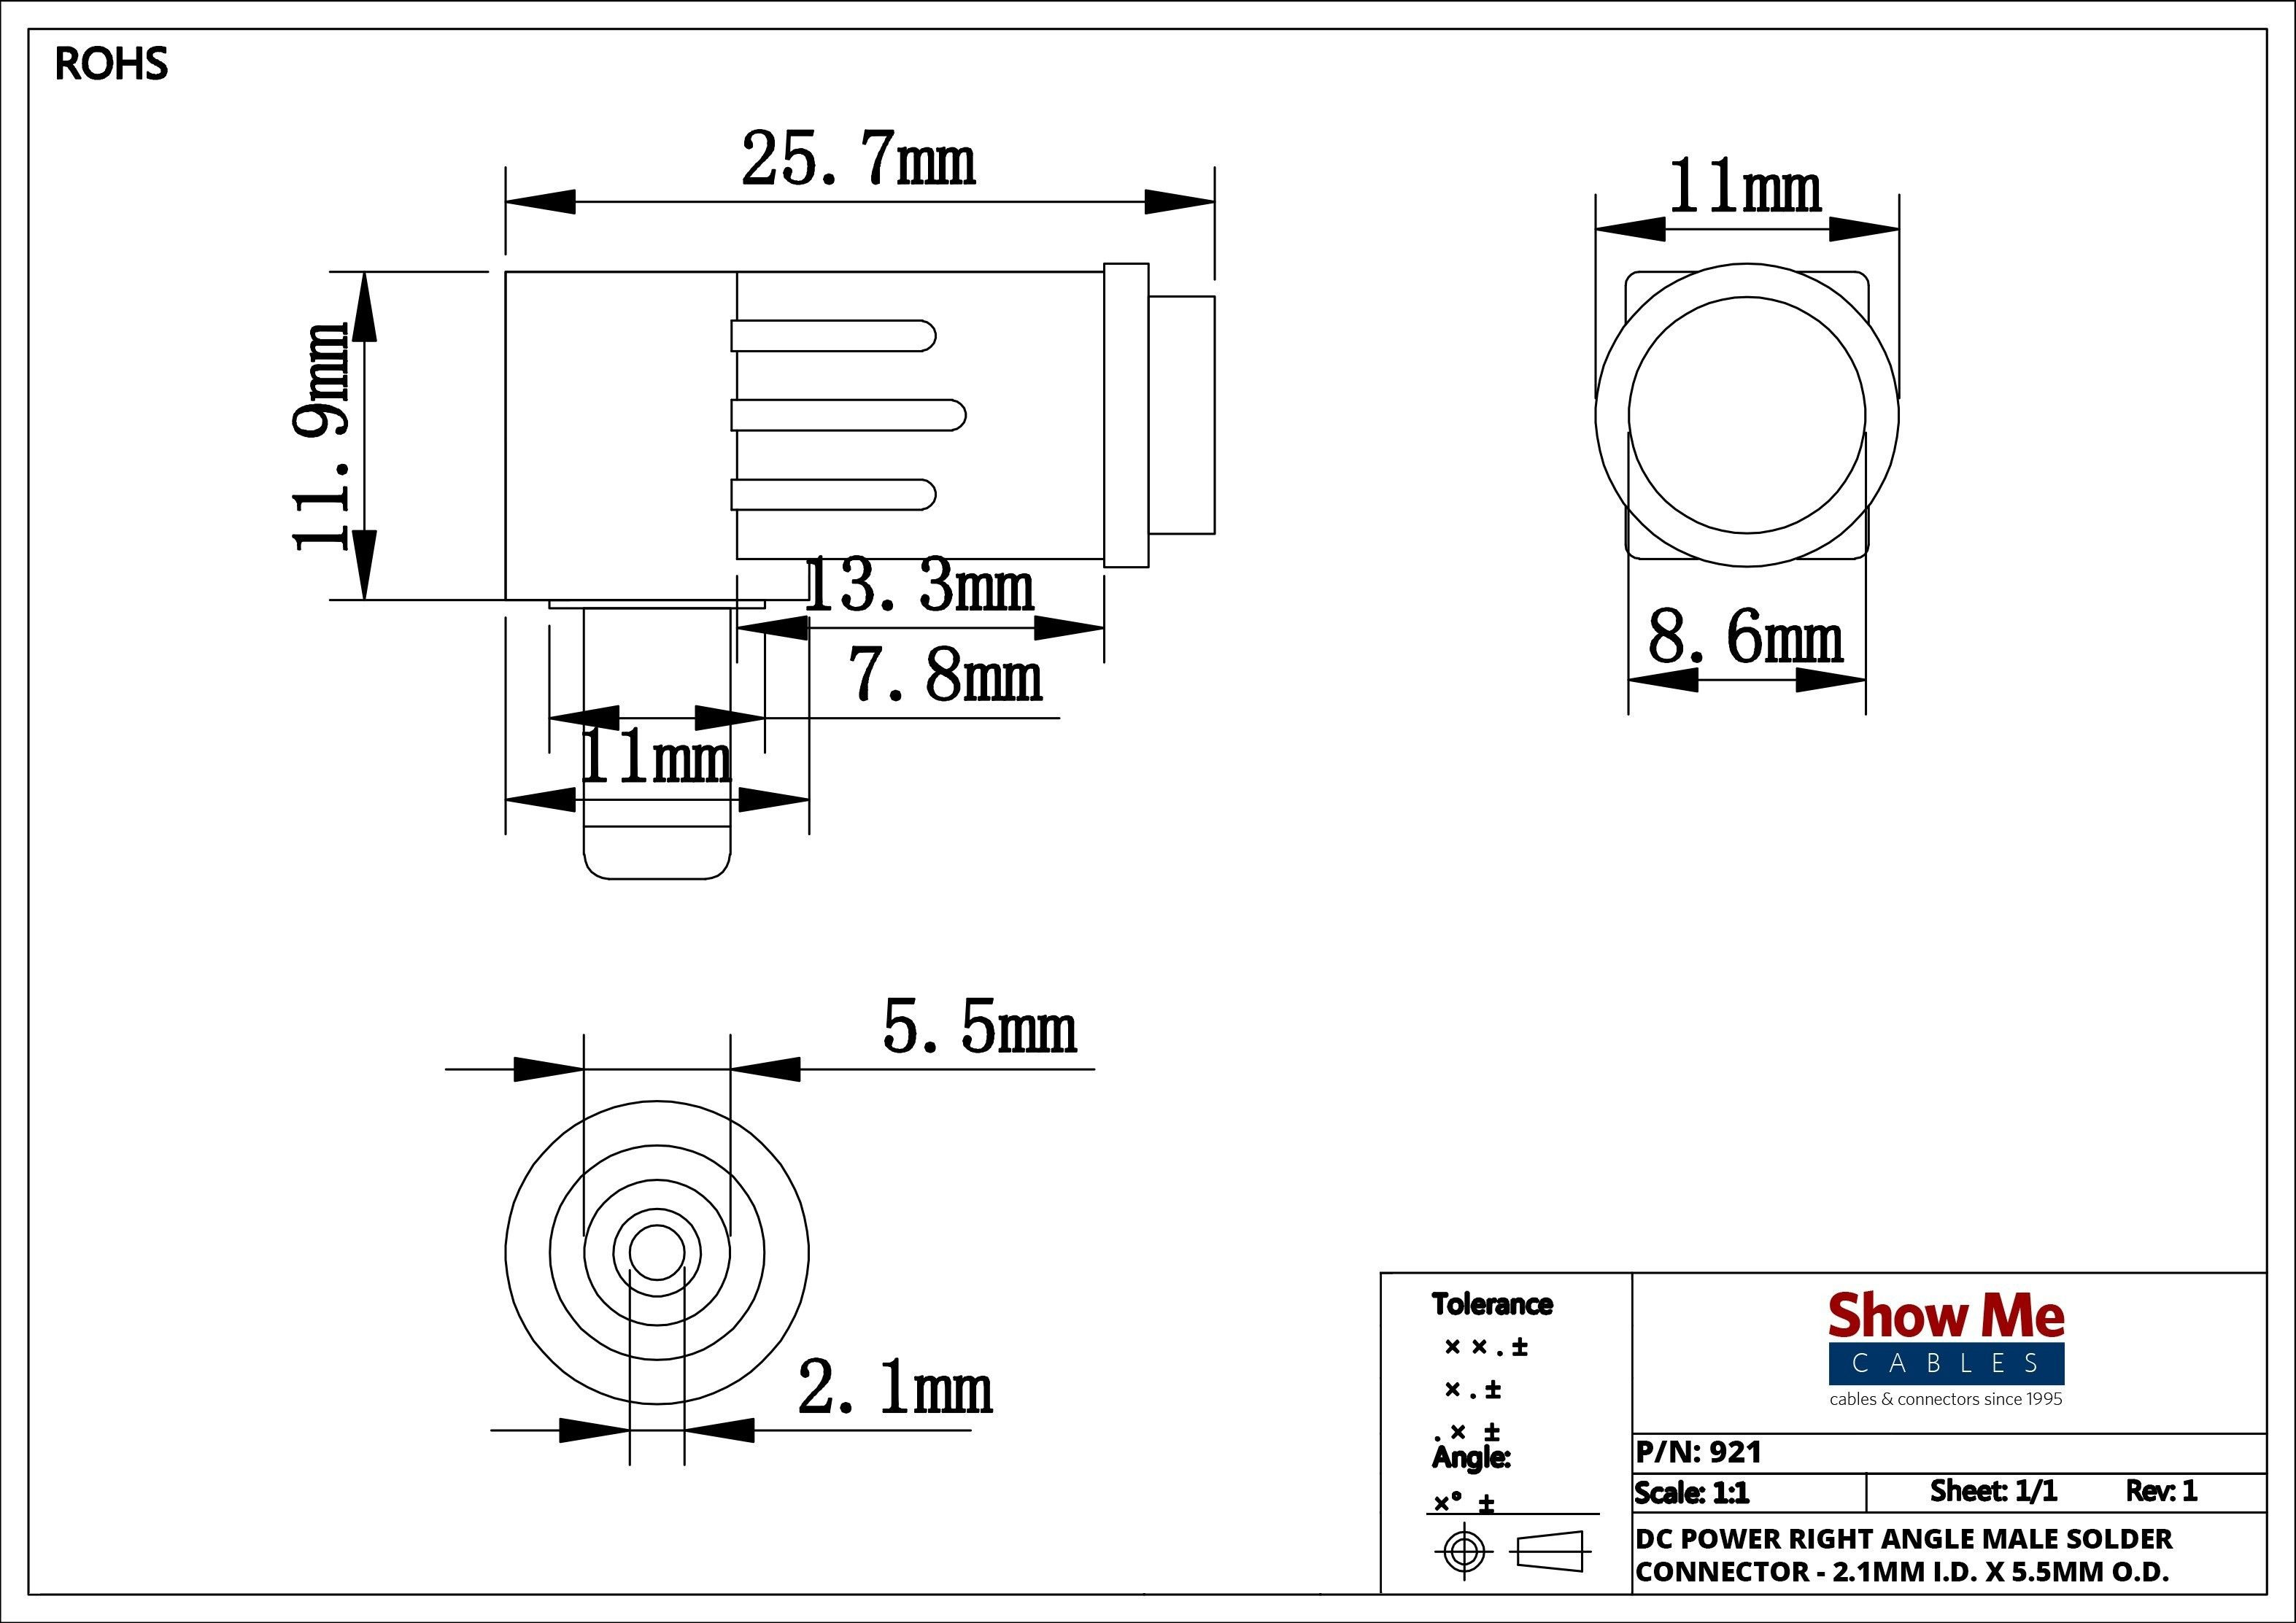 Diagram Audi A4 1999 18t Coil Diagram Full Version Hd Quality Coil Diagram Diagramflinnr Chihuahuaboutique It